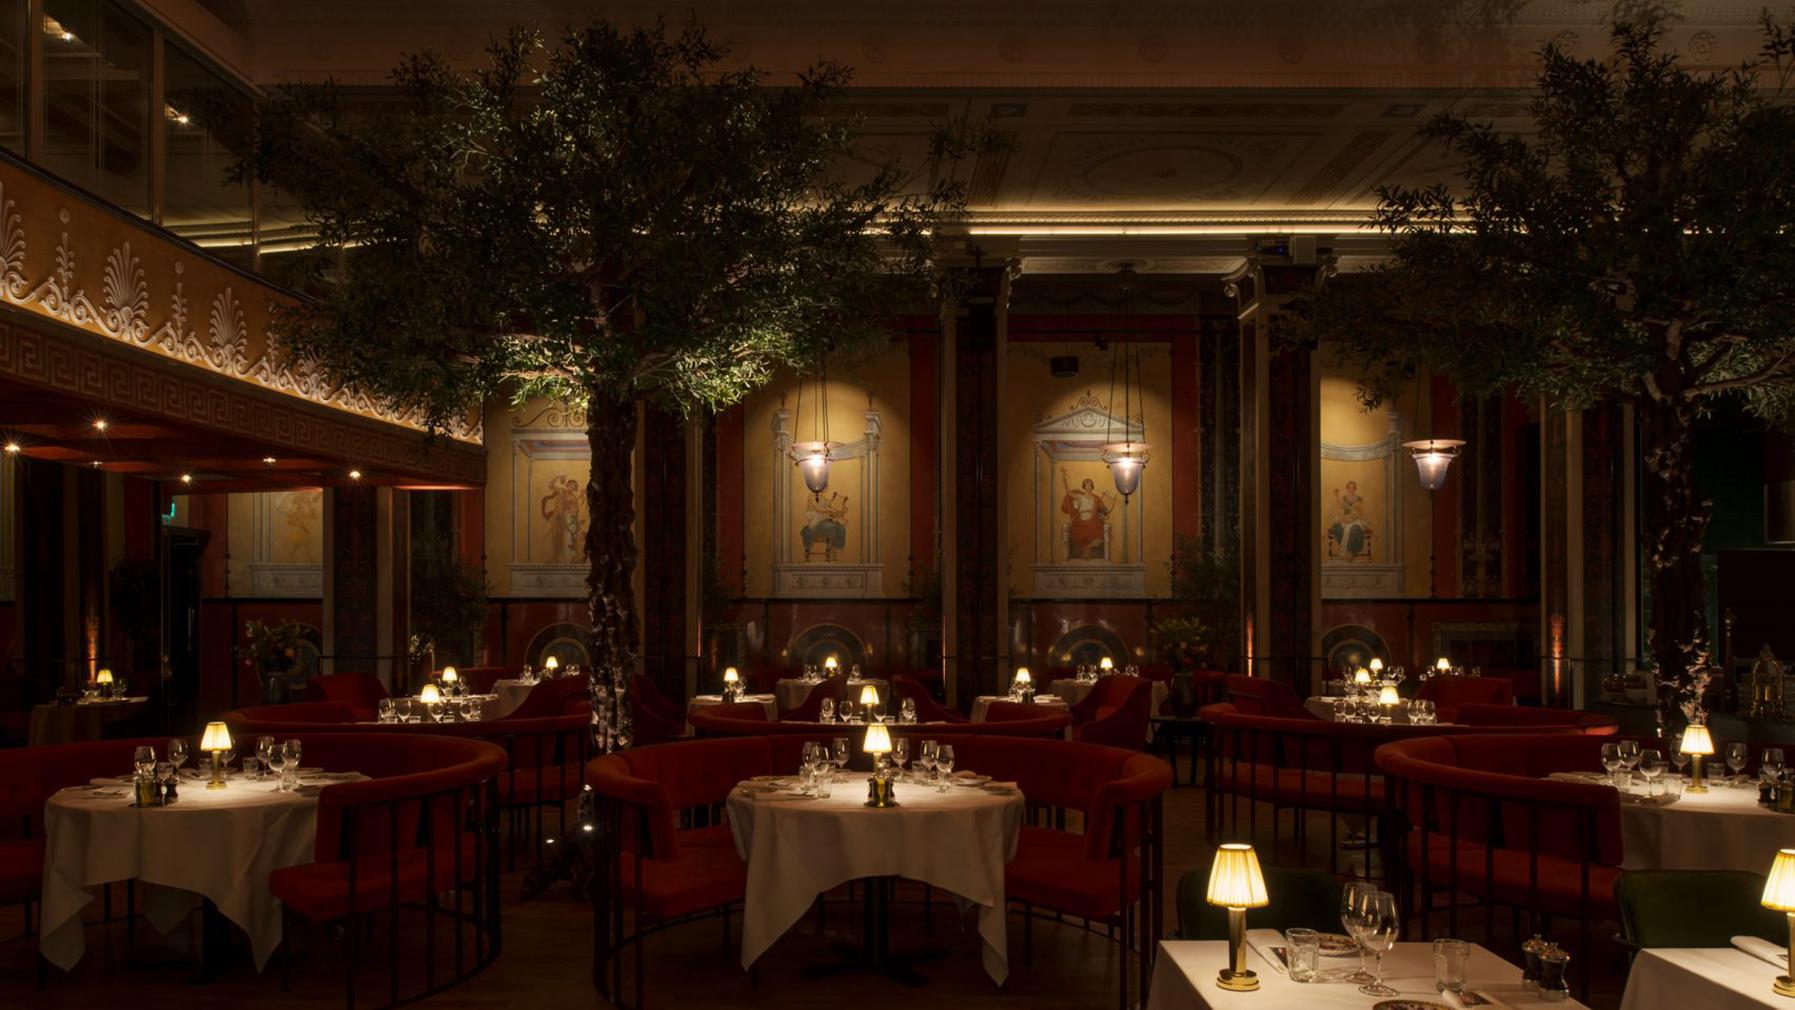 Stockholm cinema enjoys second life as decadent Italian restaurant L'Avventura